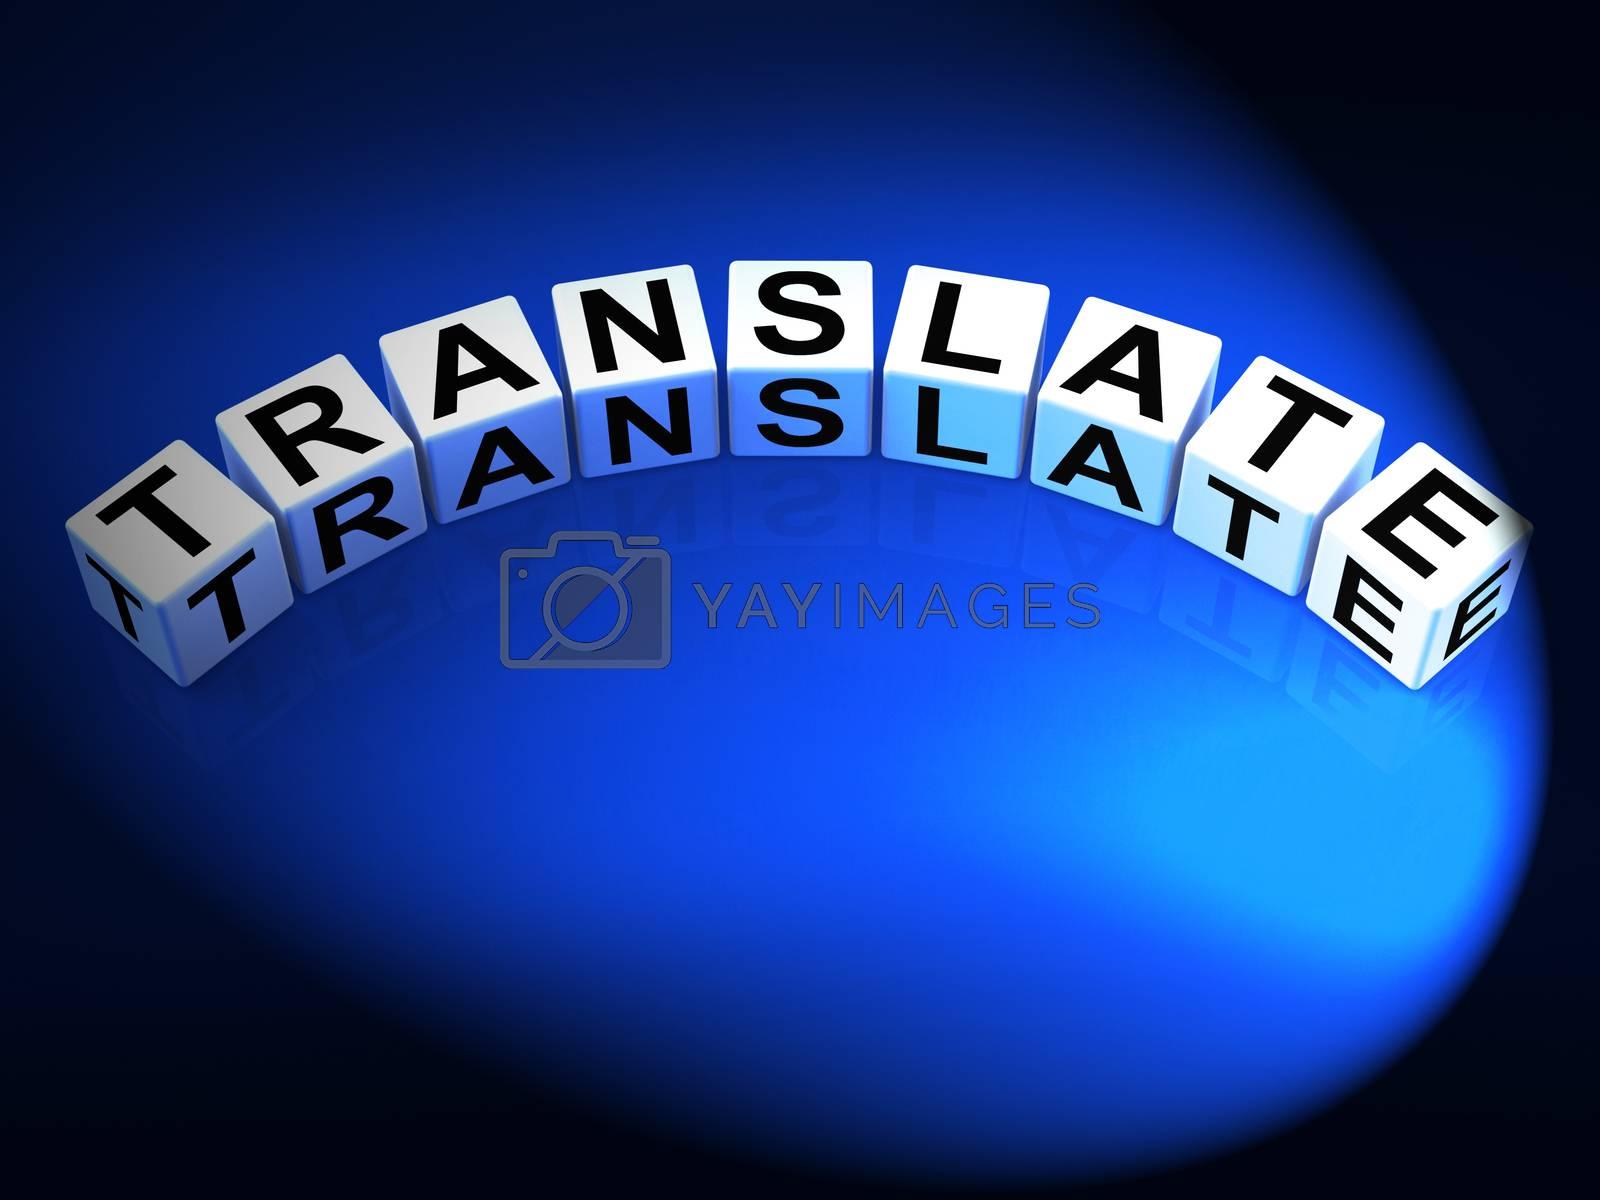 Translate Dice Show Multilingual or International Translator by stuartmiles